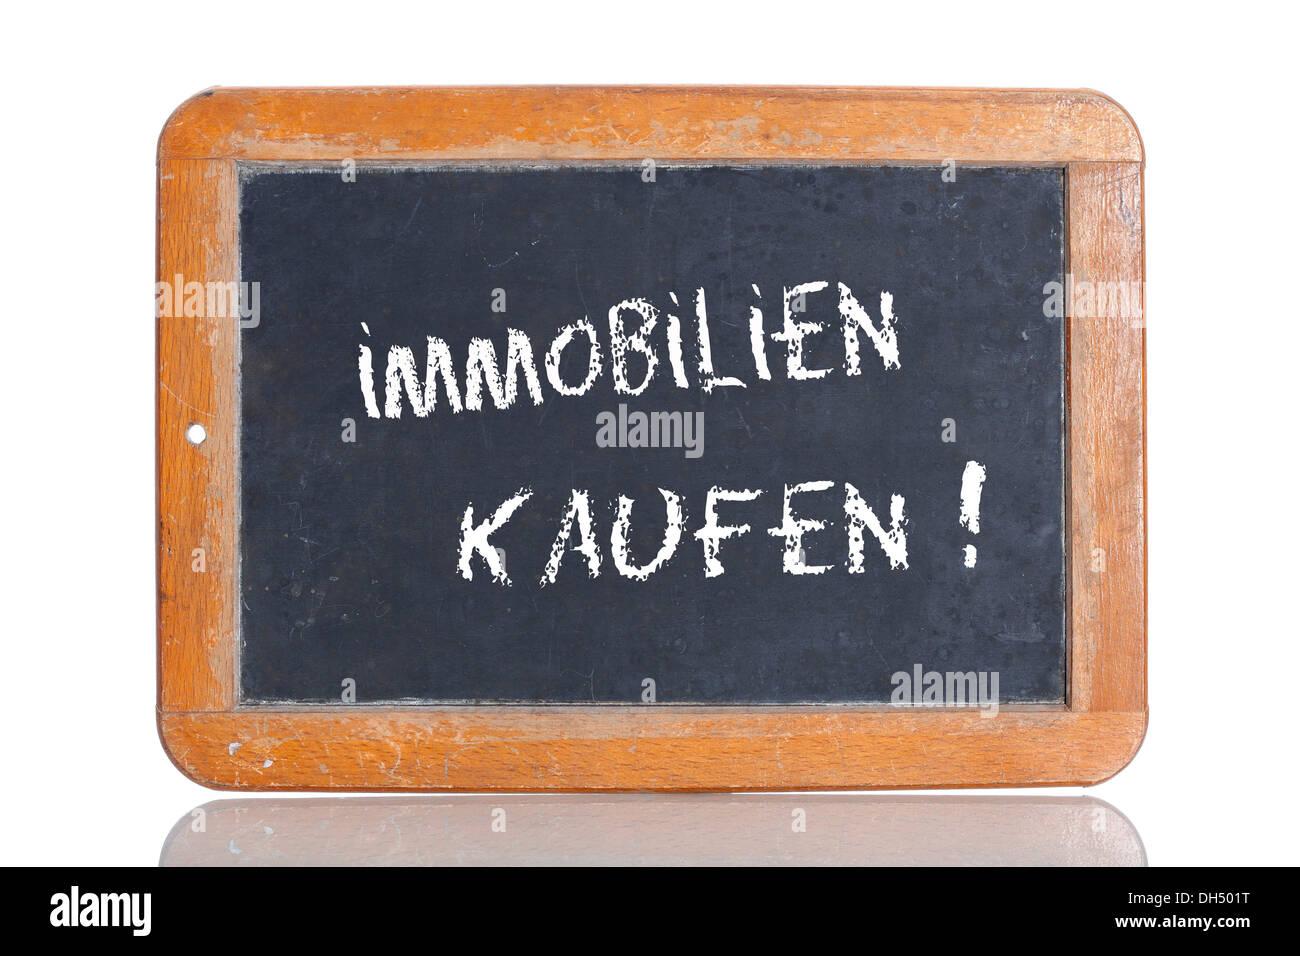 Old chalkboard, lettering 'IMMOBILIEN KAUFEN', German for 'BUY PROPERTY' - Stock Image